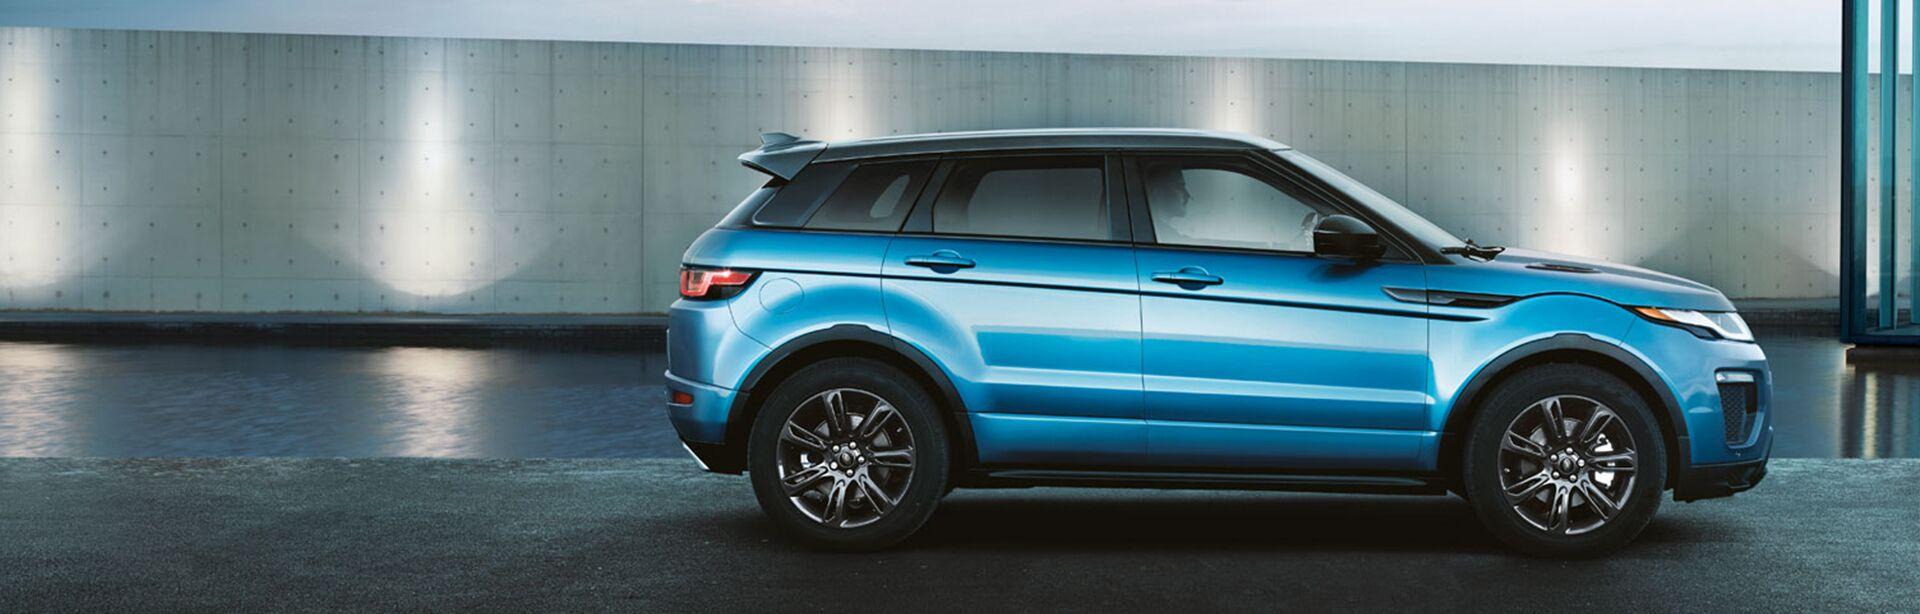 2019 Land Rover Range Rover Evoque 5 Door SE Premium